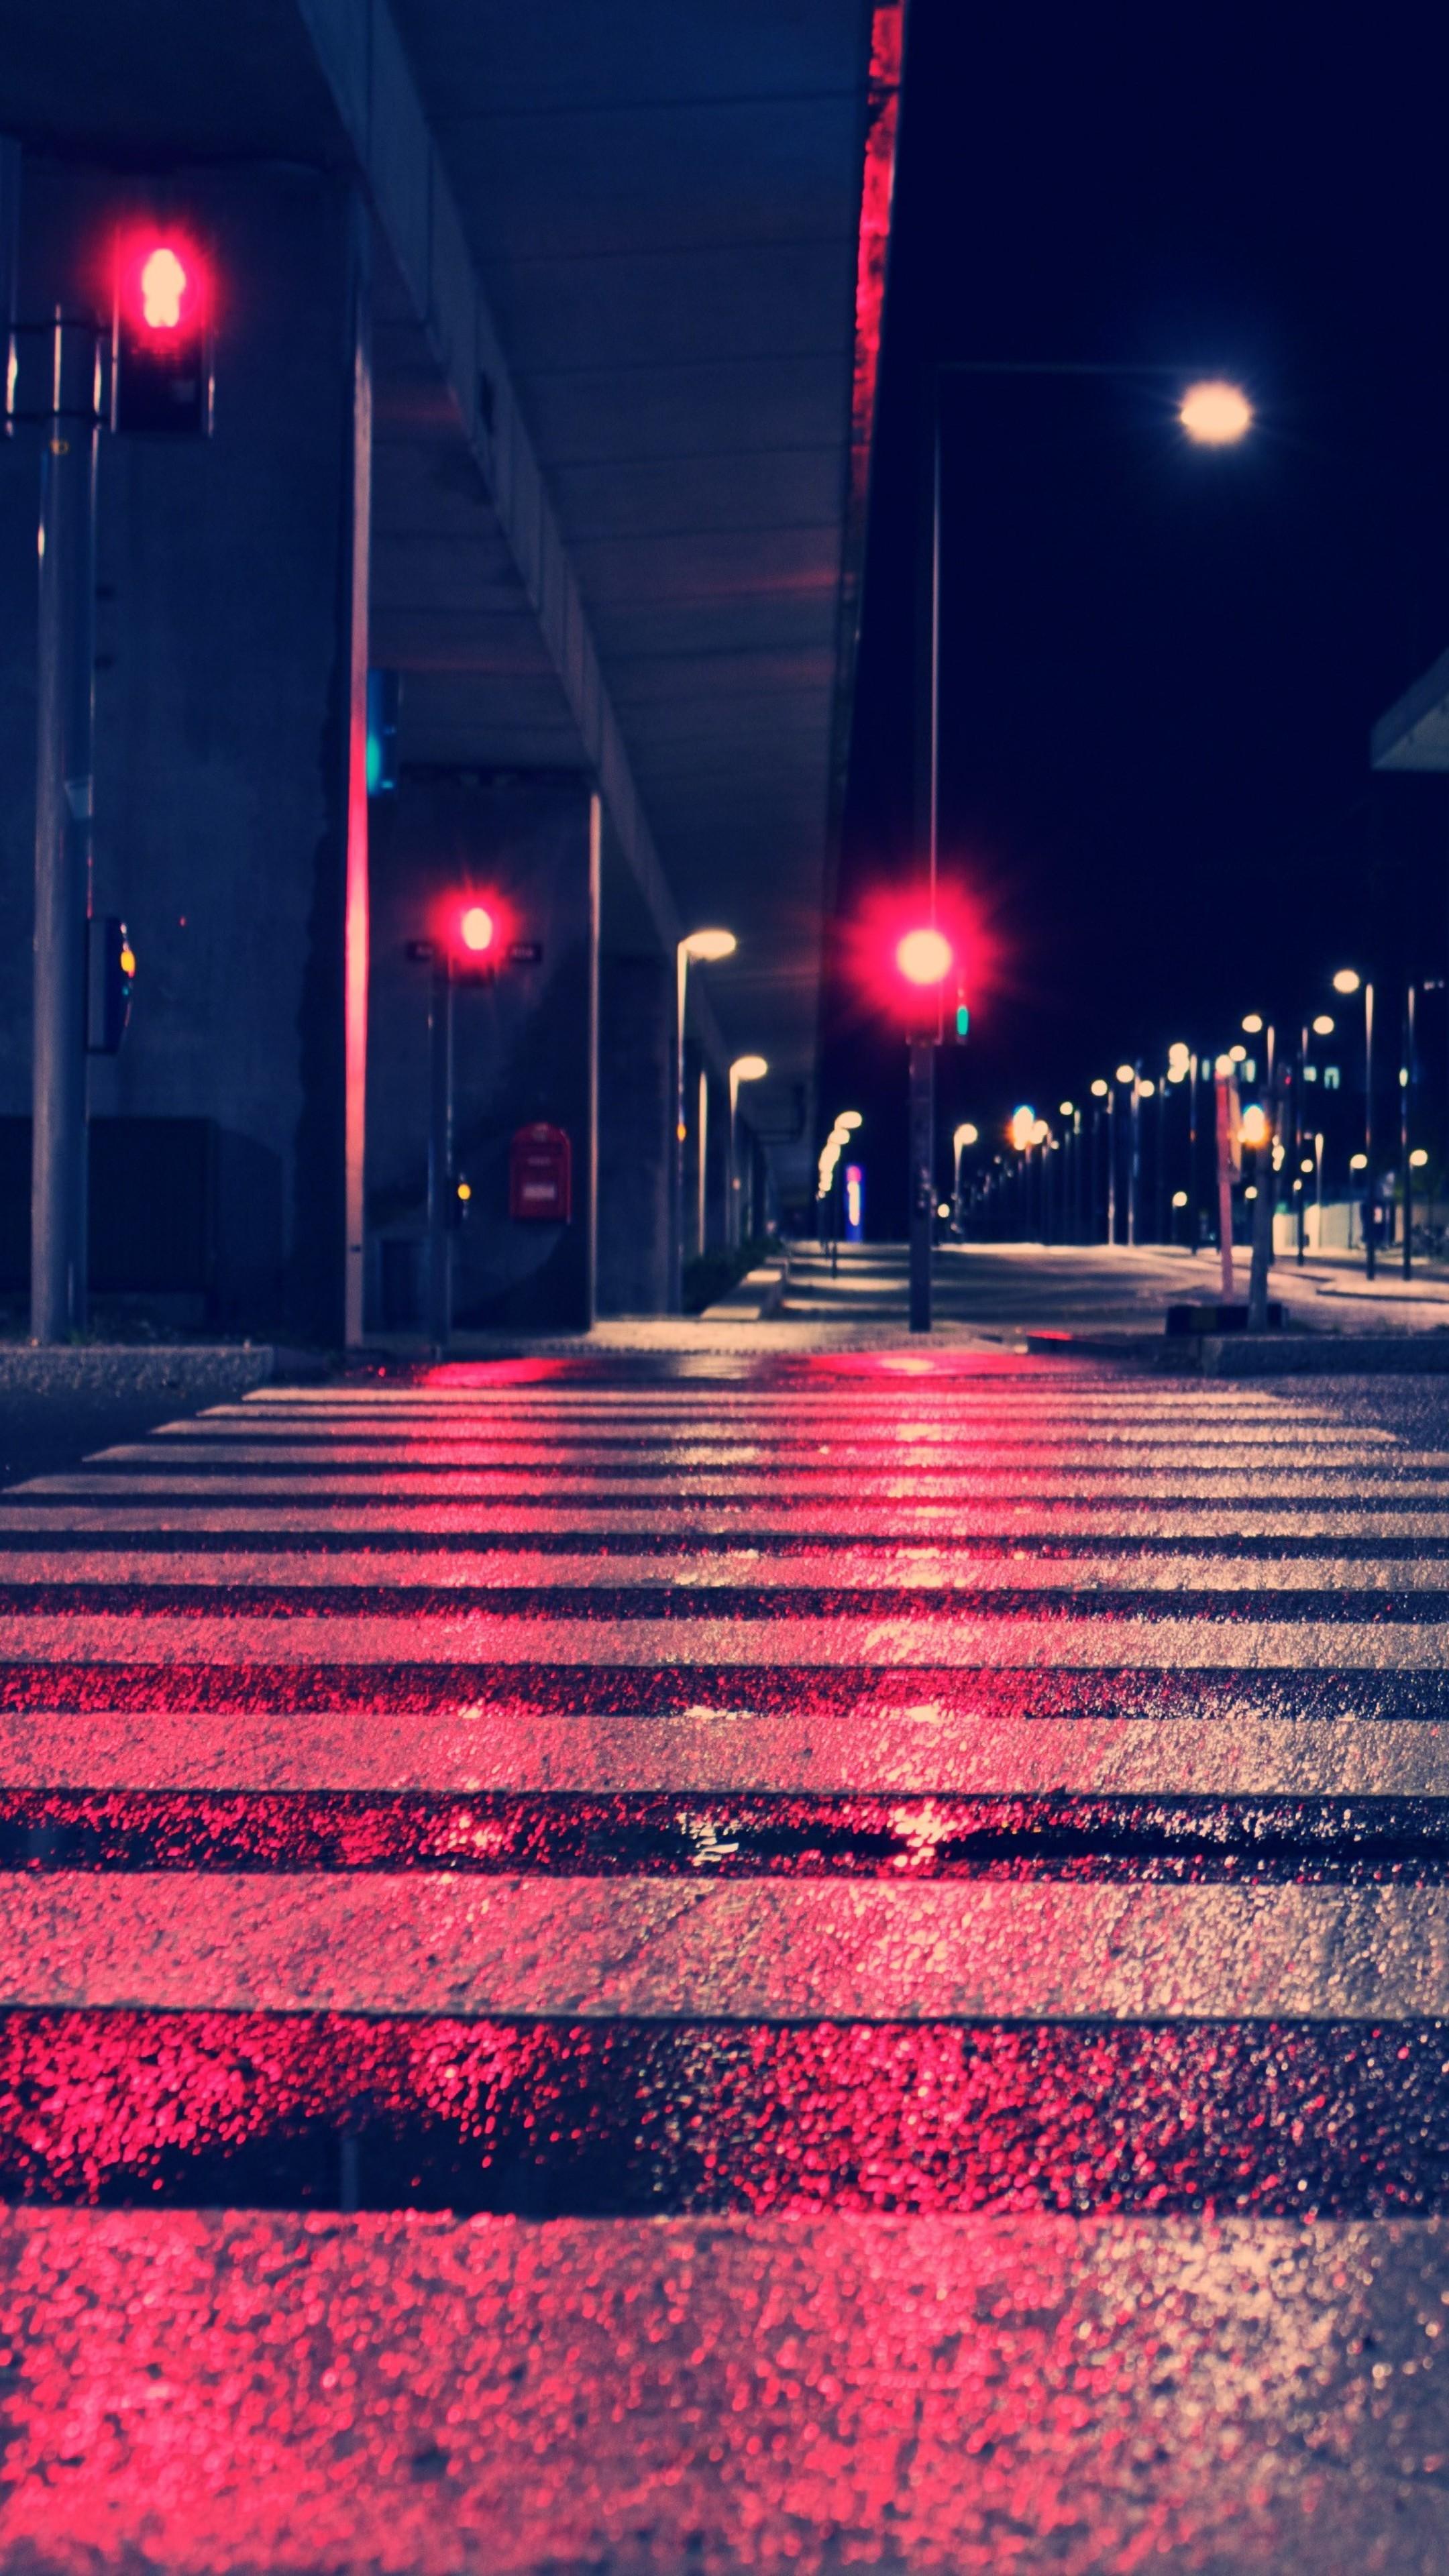 Night City Lights Street 4k Download Free Wallpapers